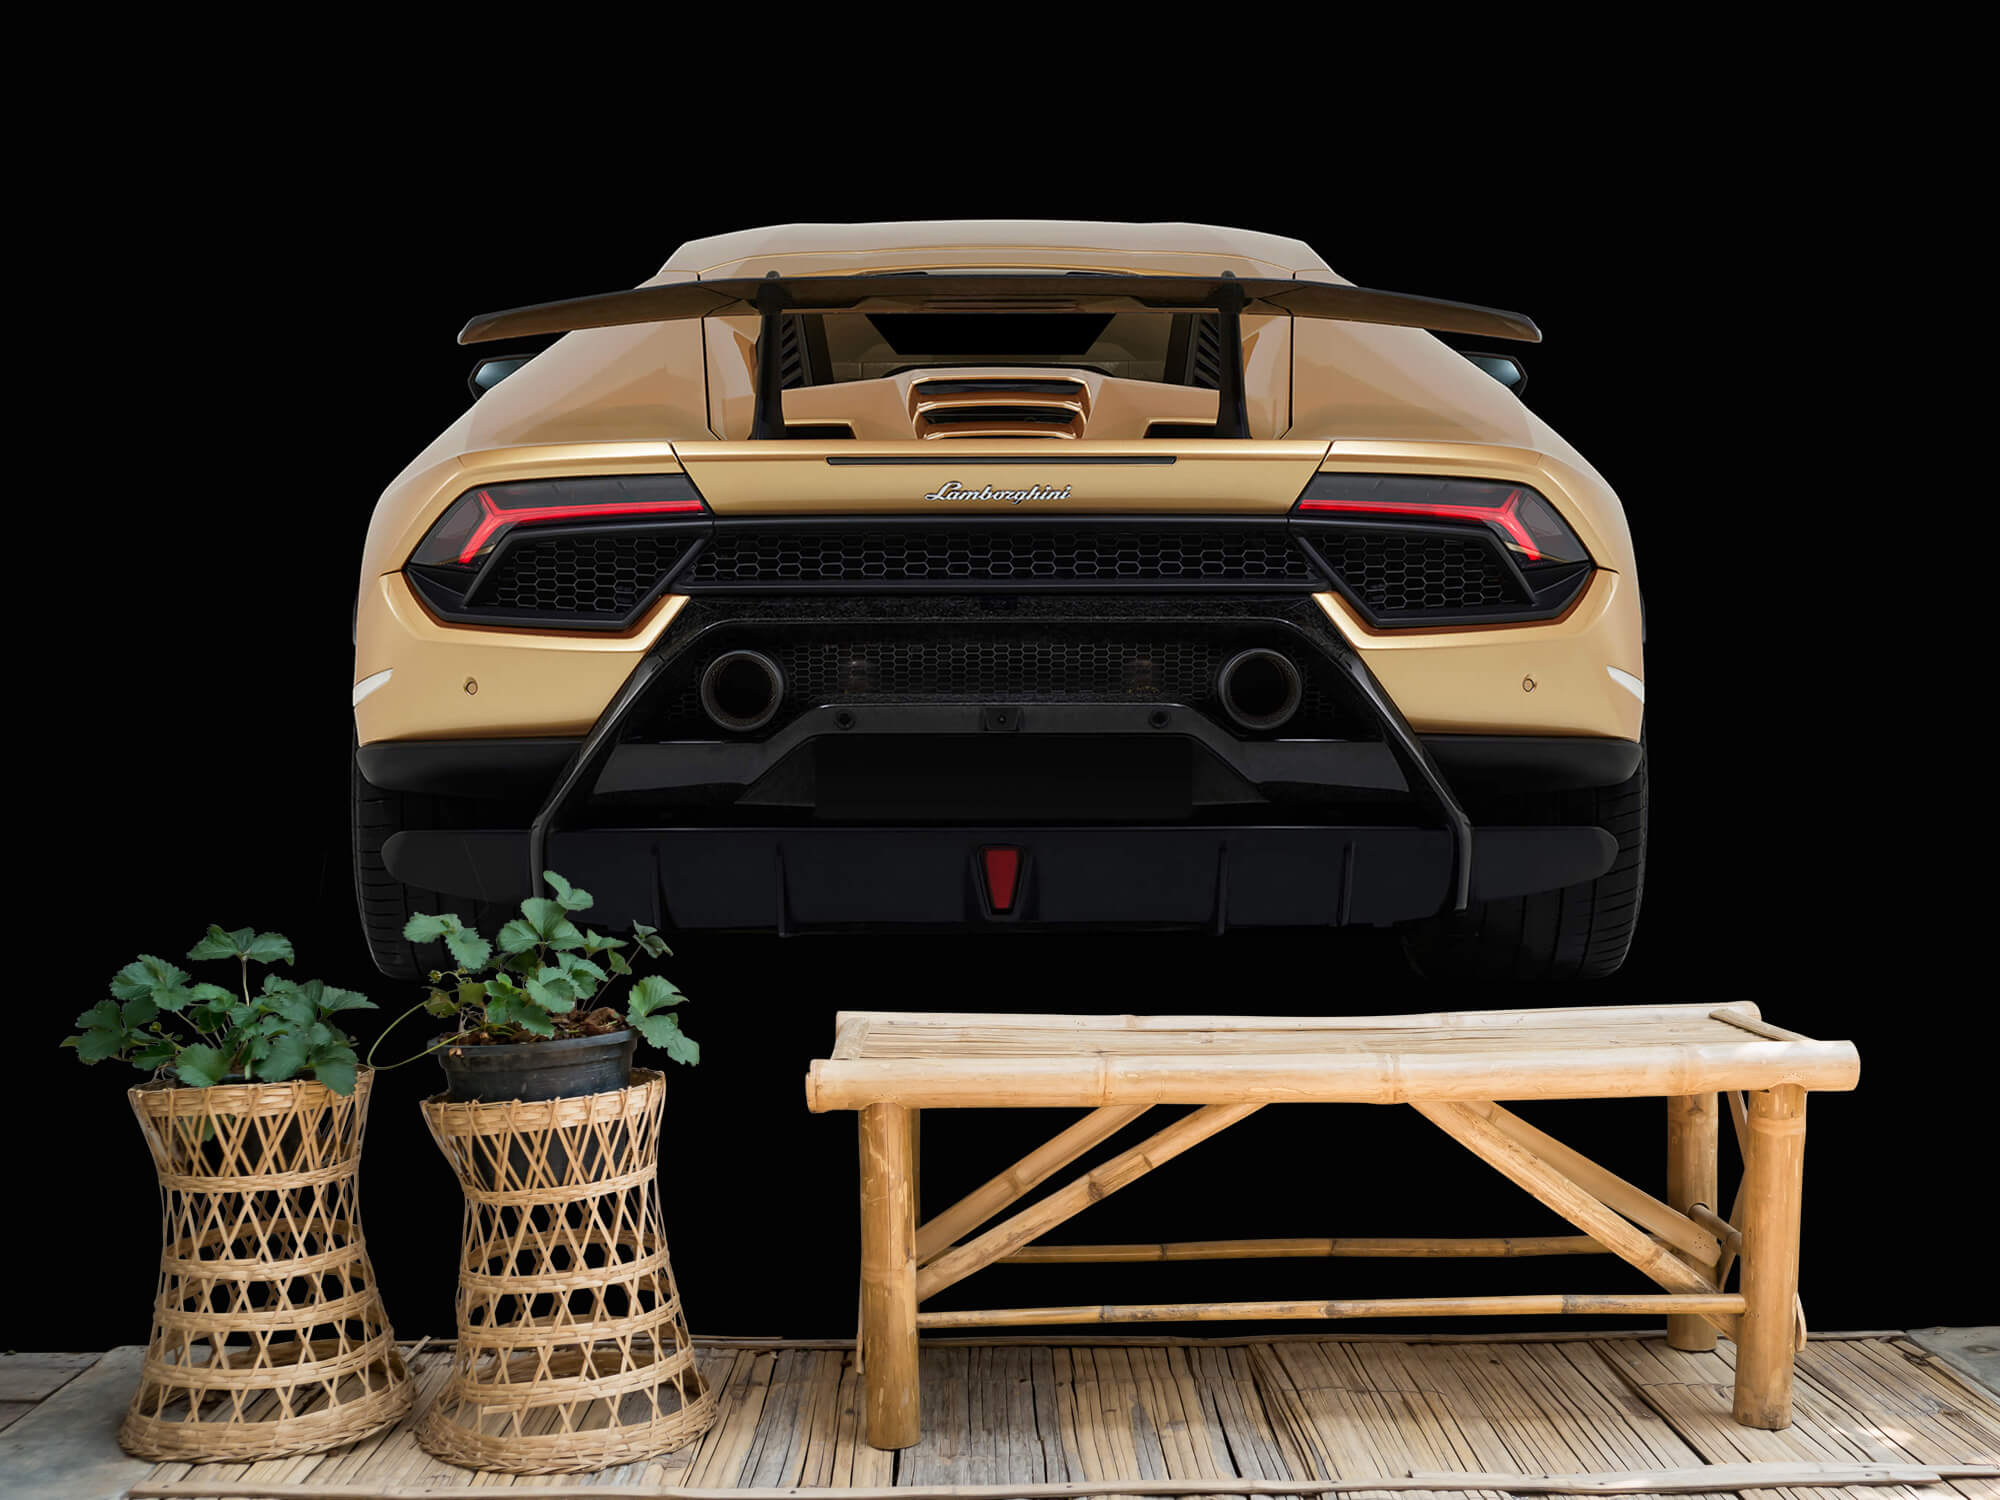 Wallpaper Lamborghini Huracán - Rear view, black 3